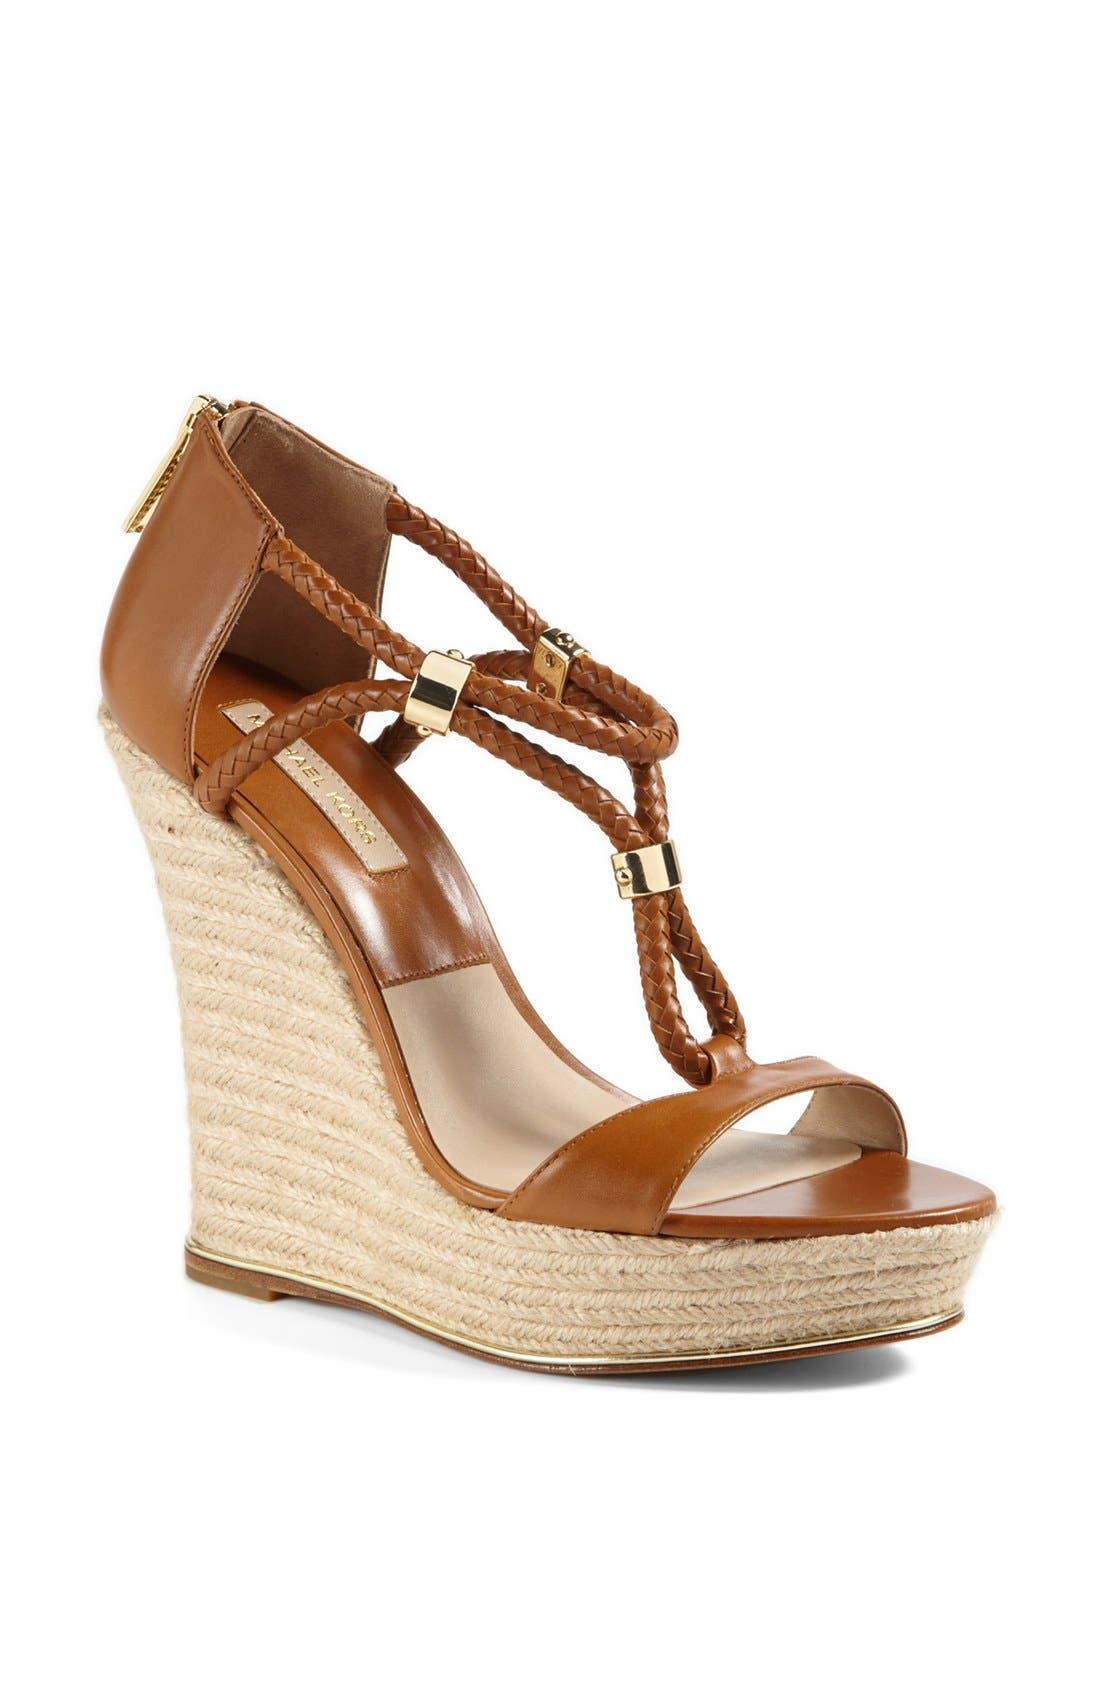 Main Image - Michael Kors 'Sherie ' Wedge Sandal